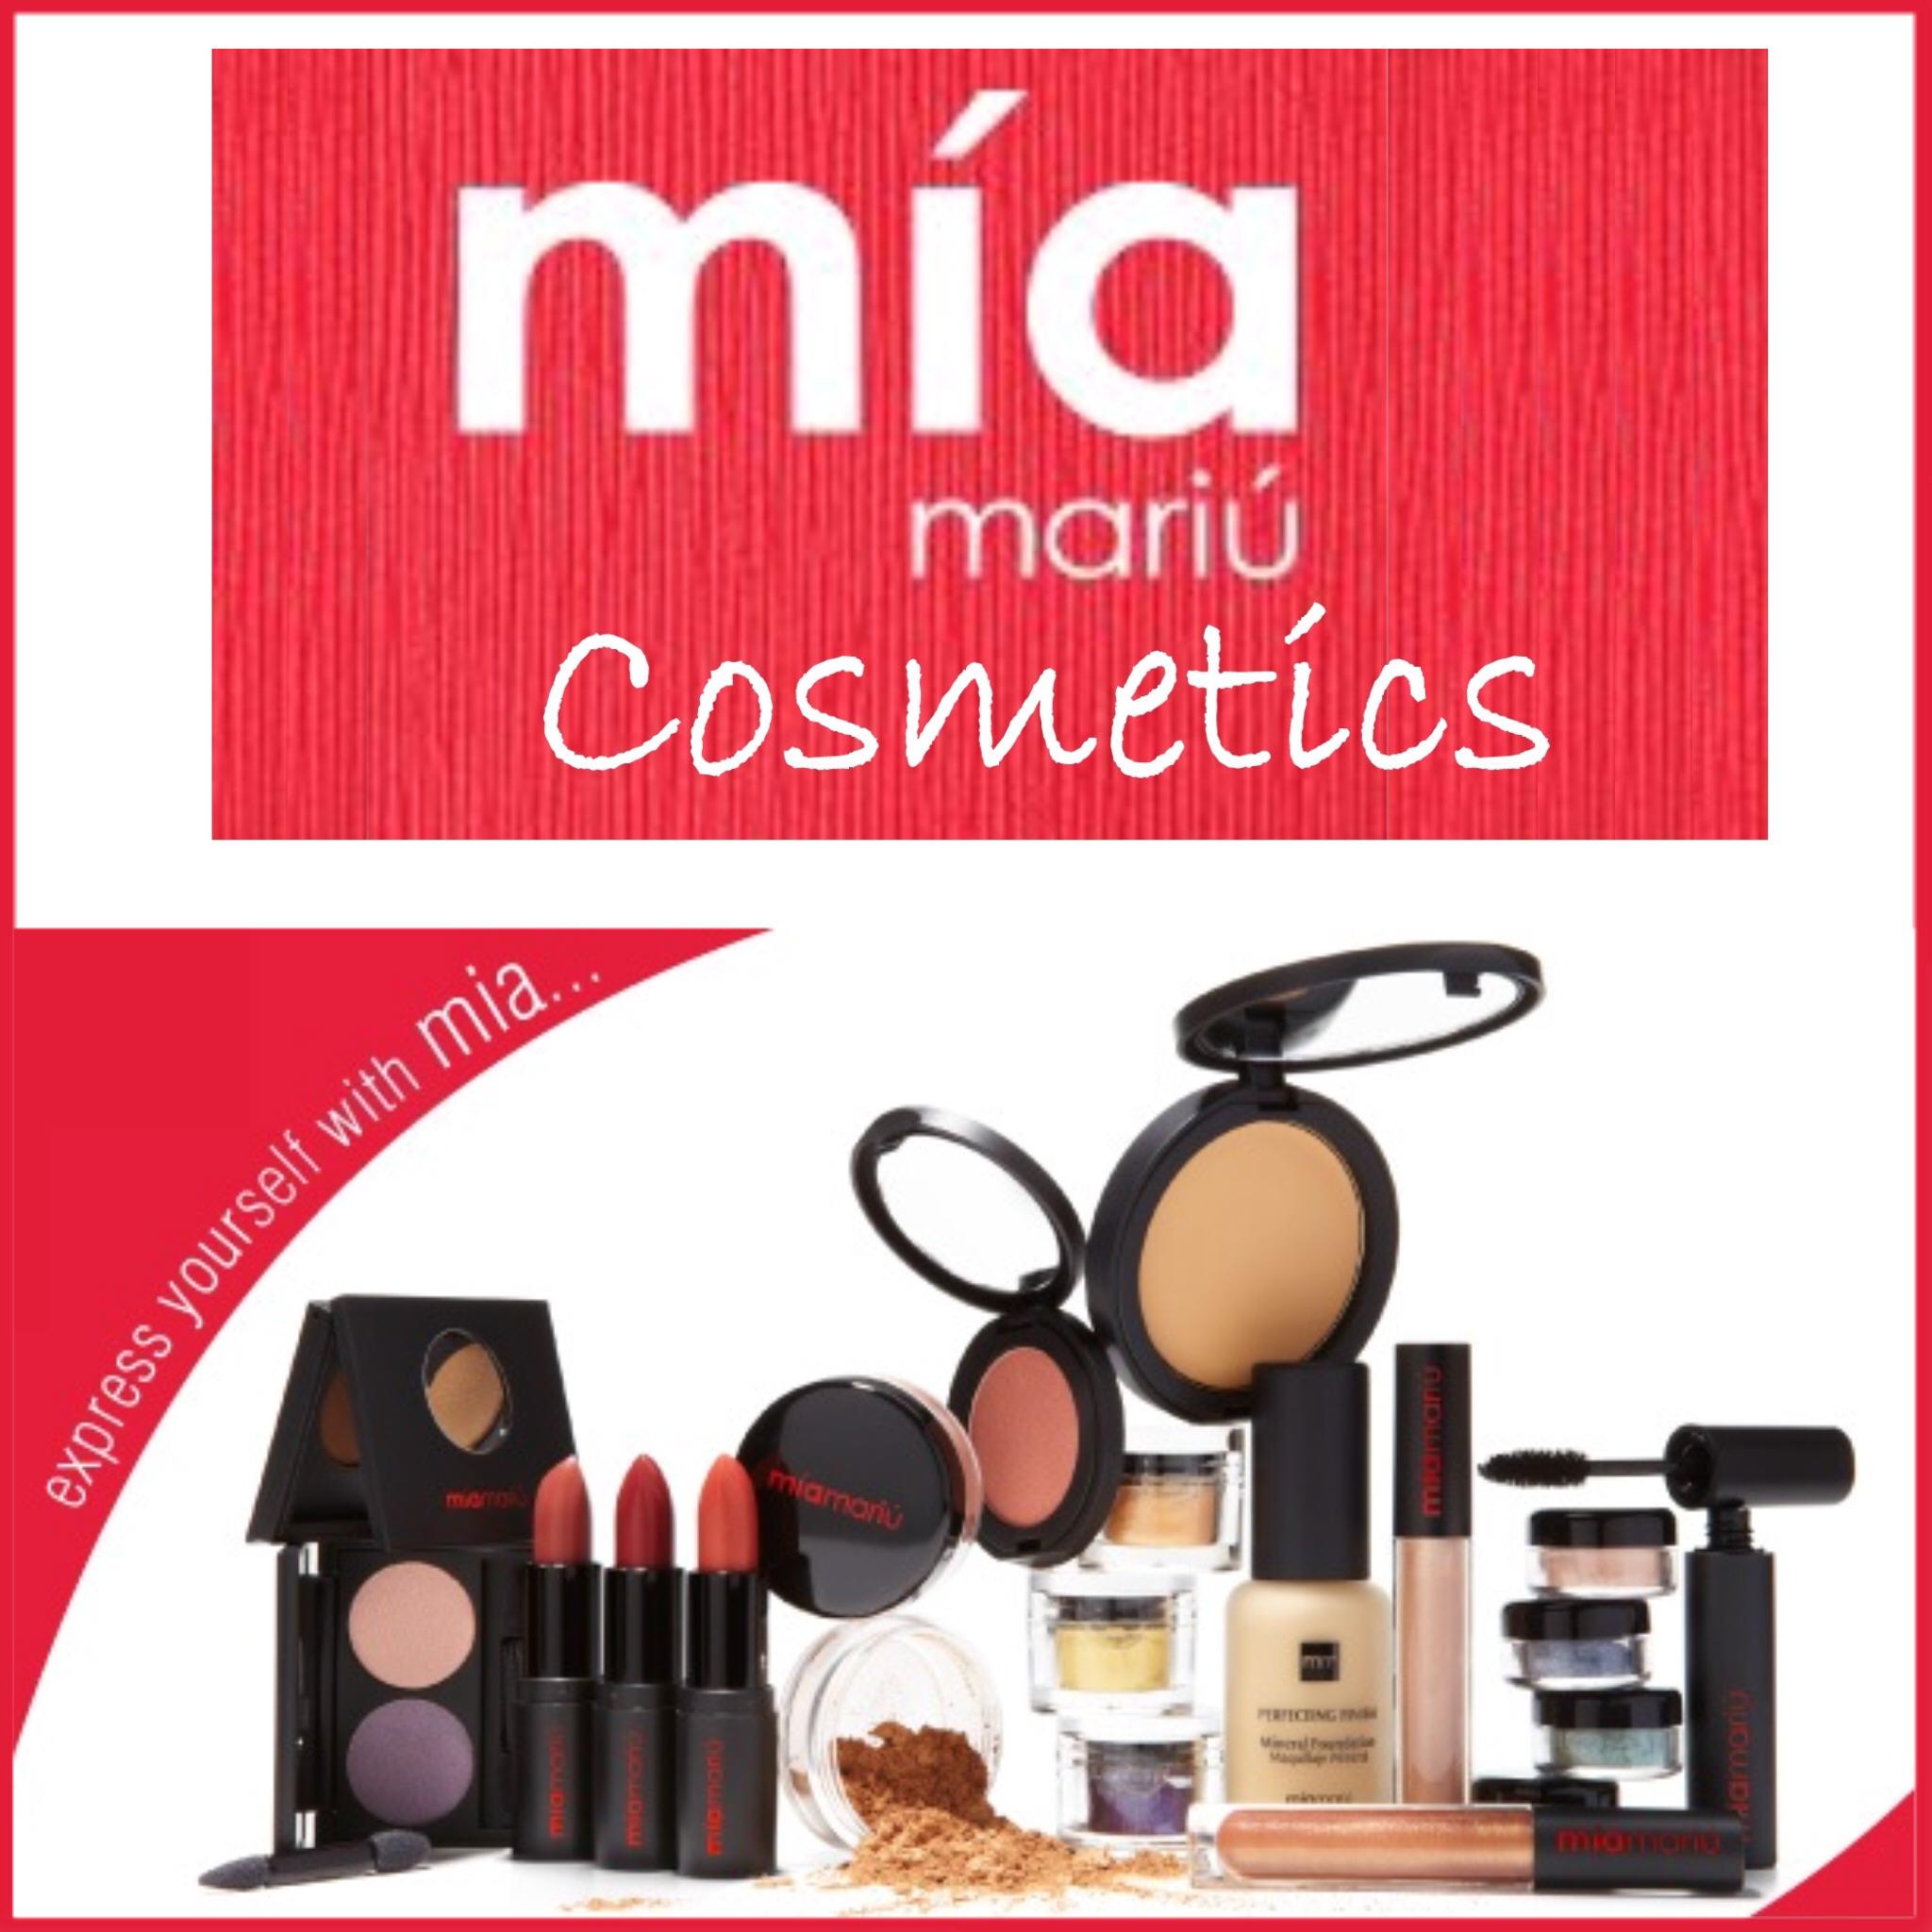 $60 Mia Mariu Mineral Cosmetics Package – 4 Products!